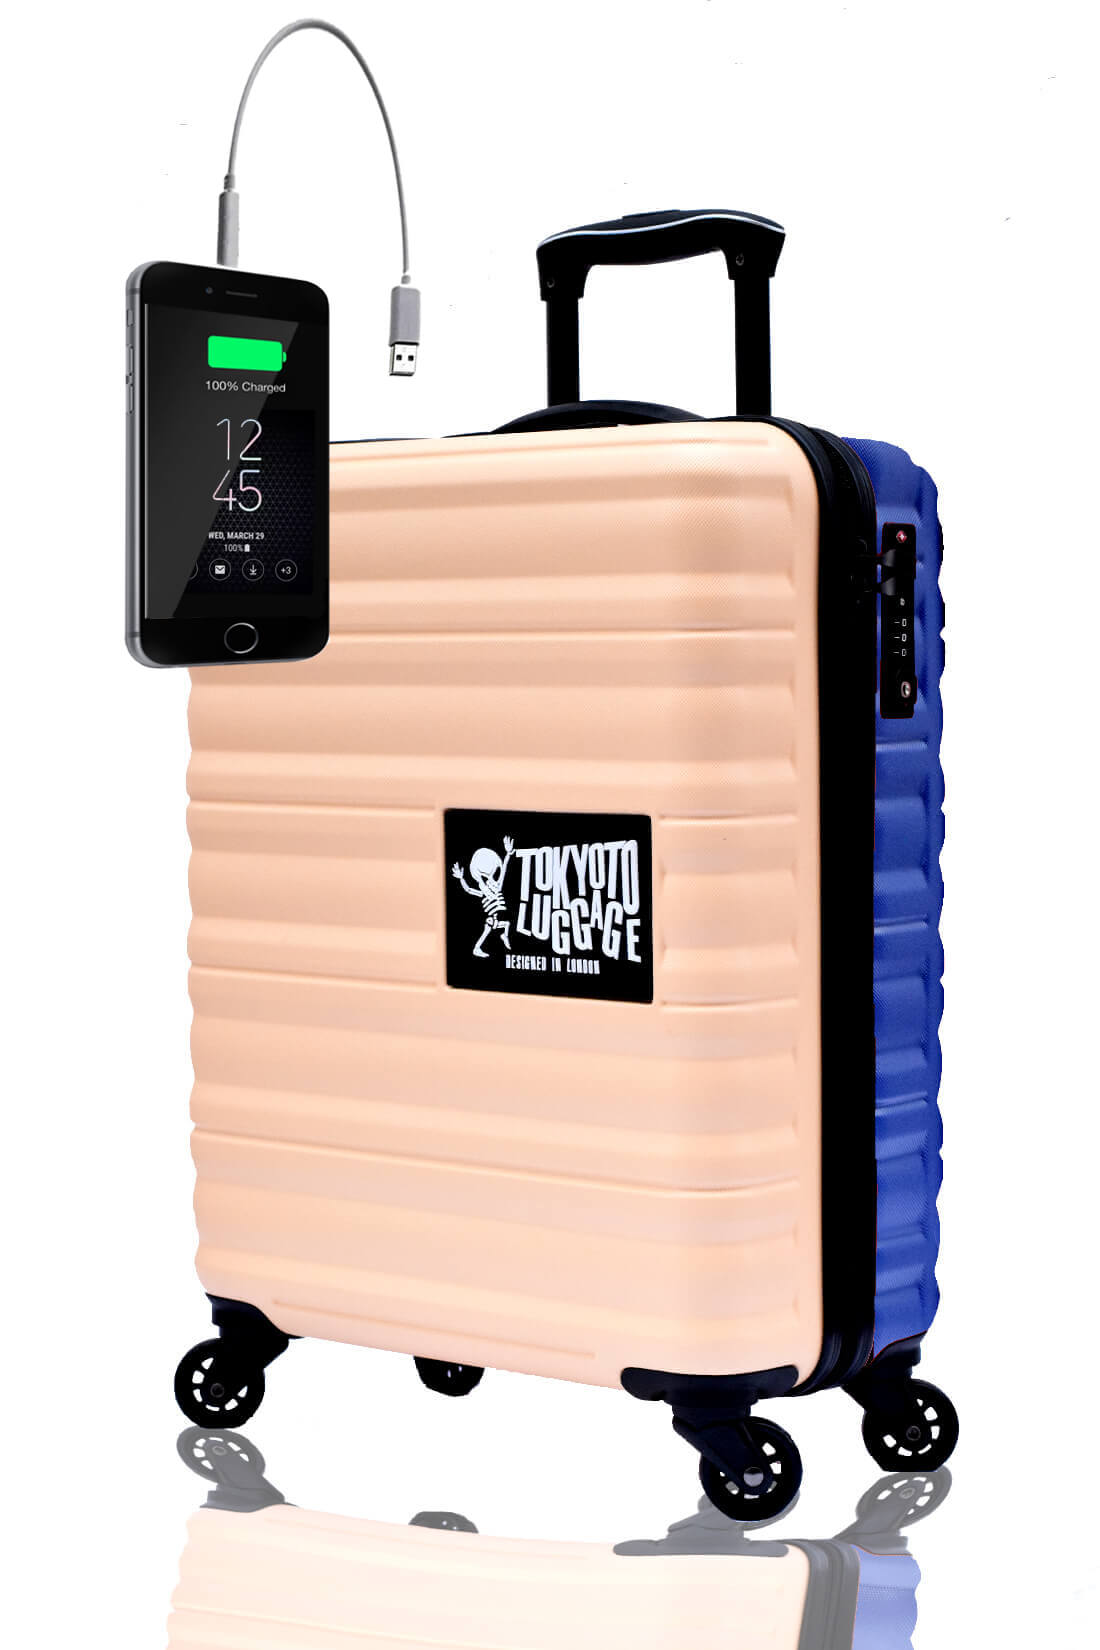 Unicolores Valise Online Cabine Trolley Enfant TOKYOTO LUGGAGE Modelle BEIGE BLUE